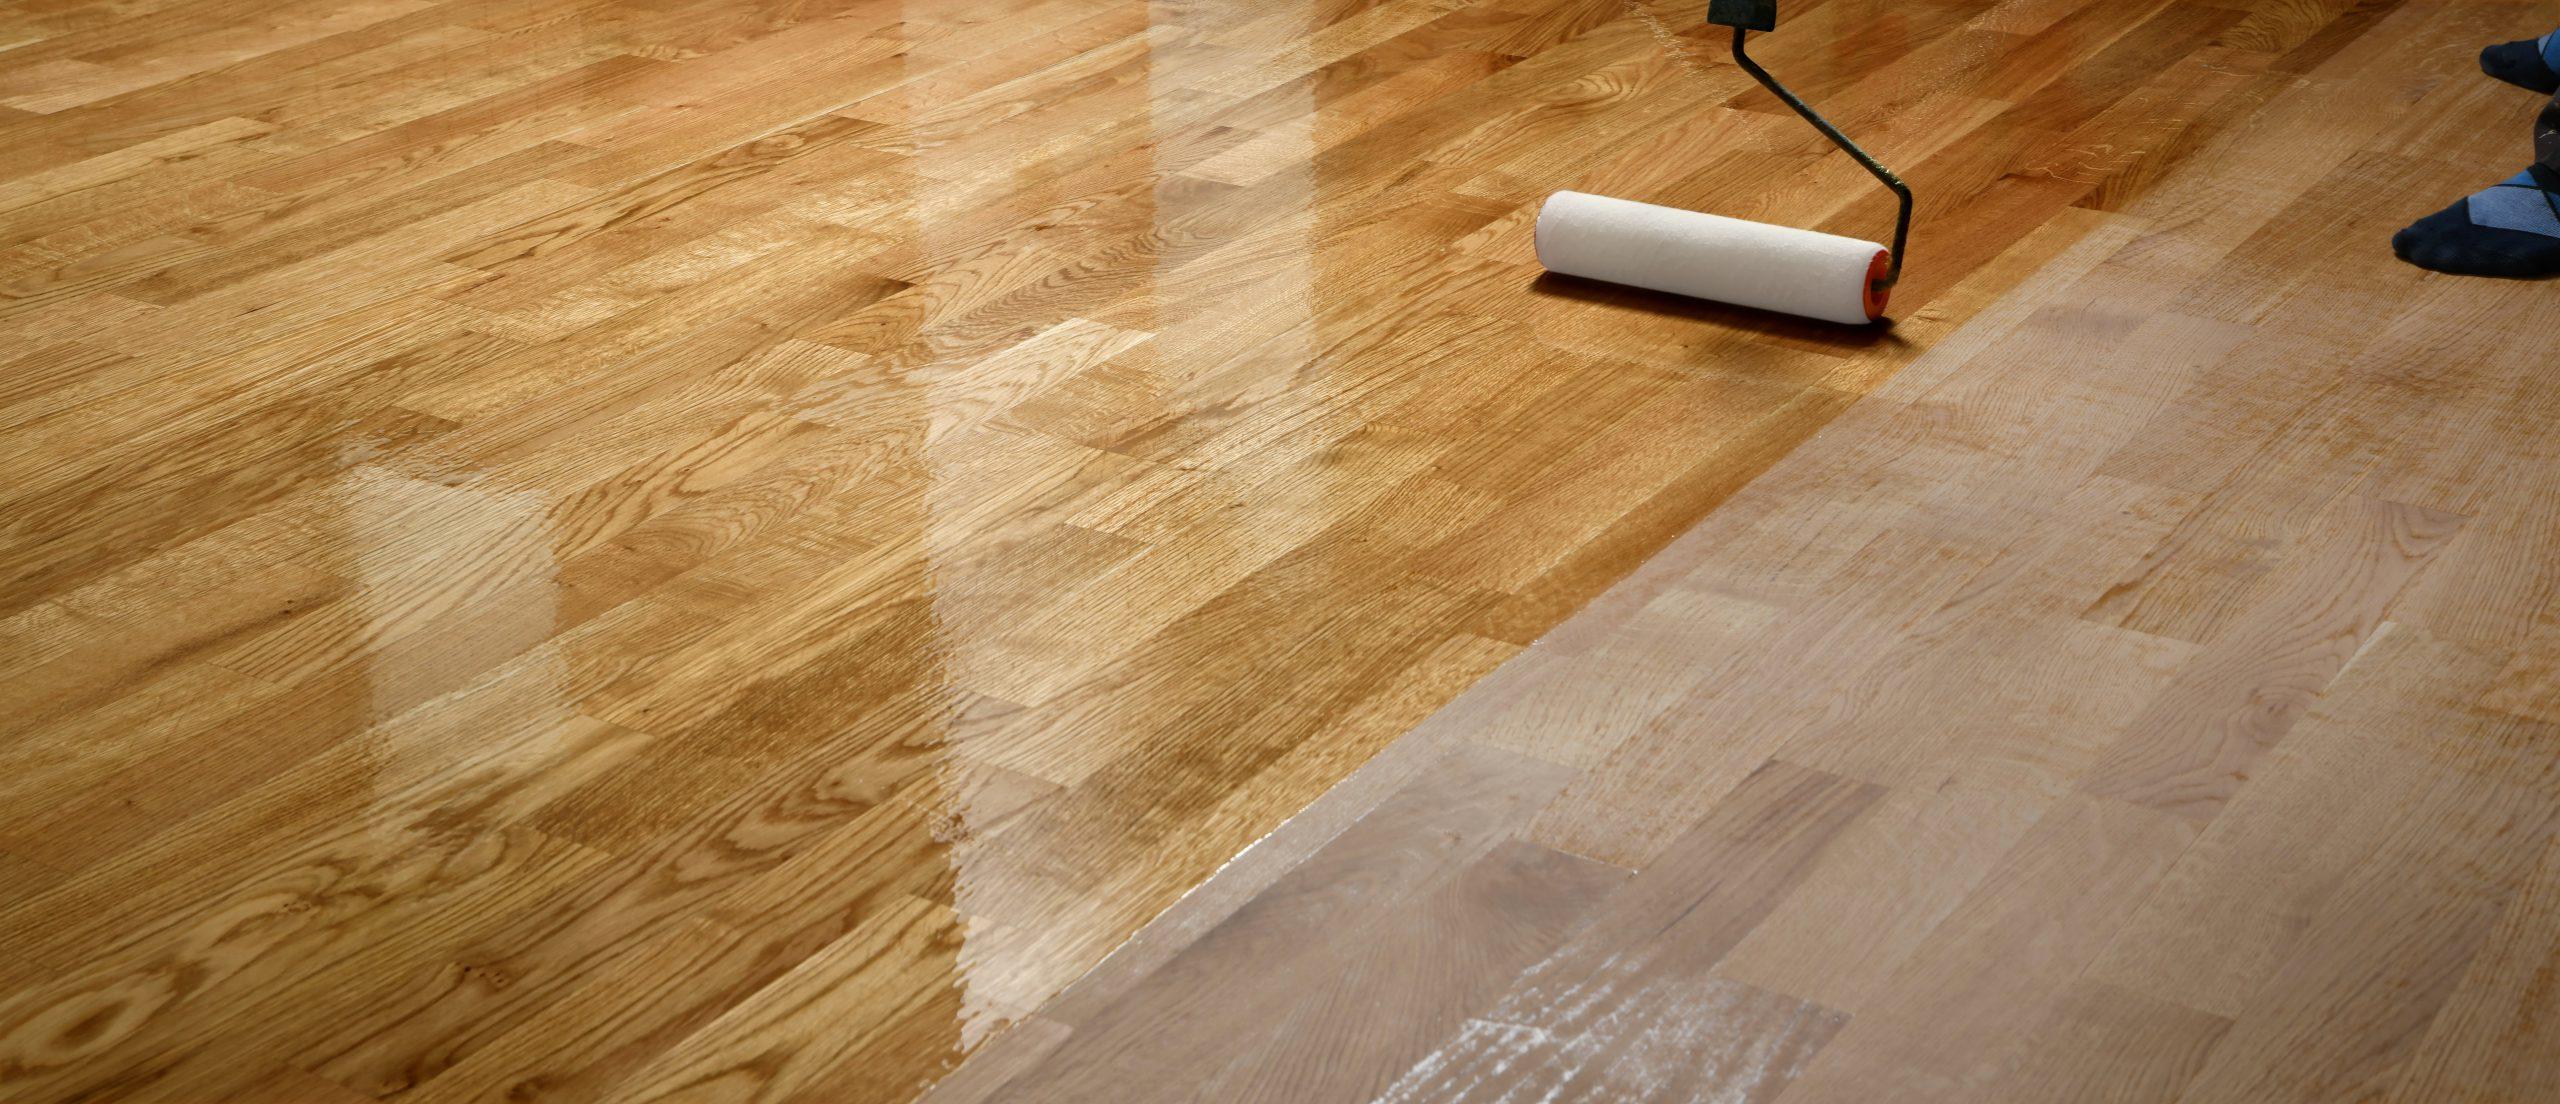 hardwood-flooring-hardwood-floor-refinishing